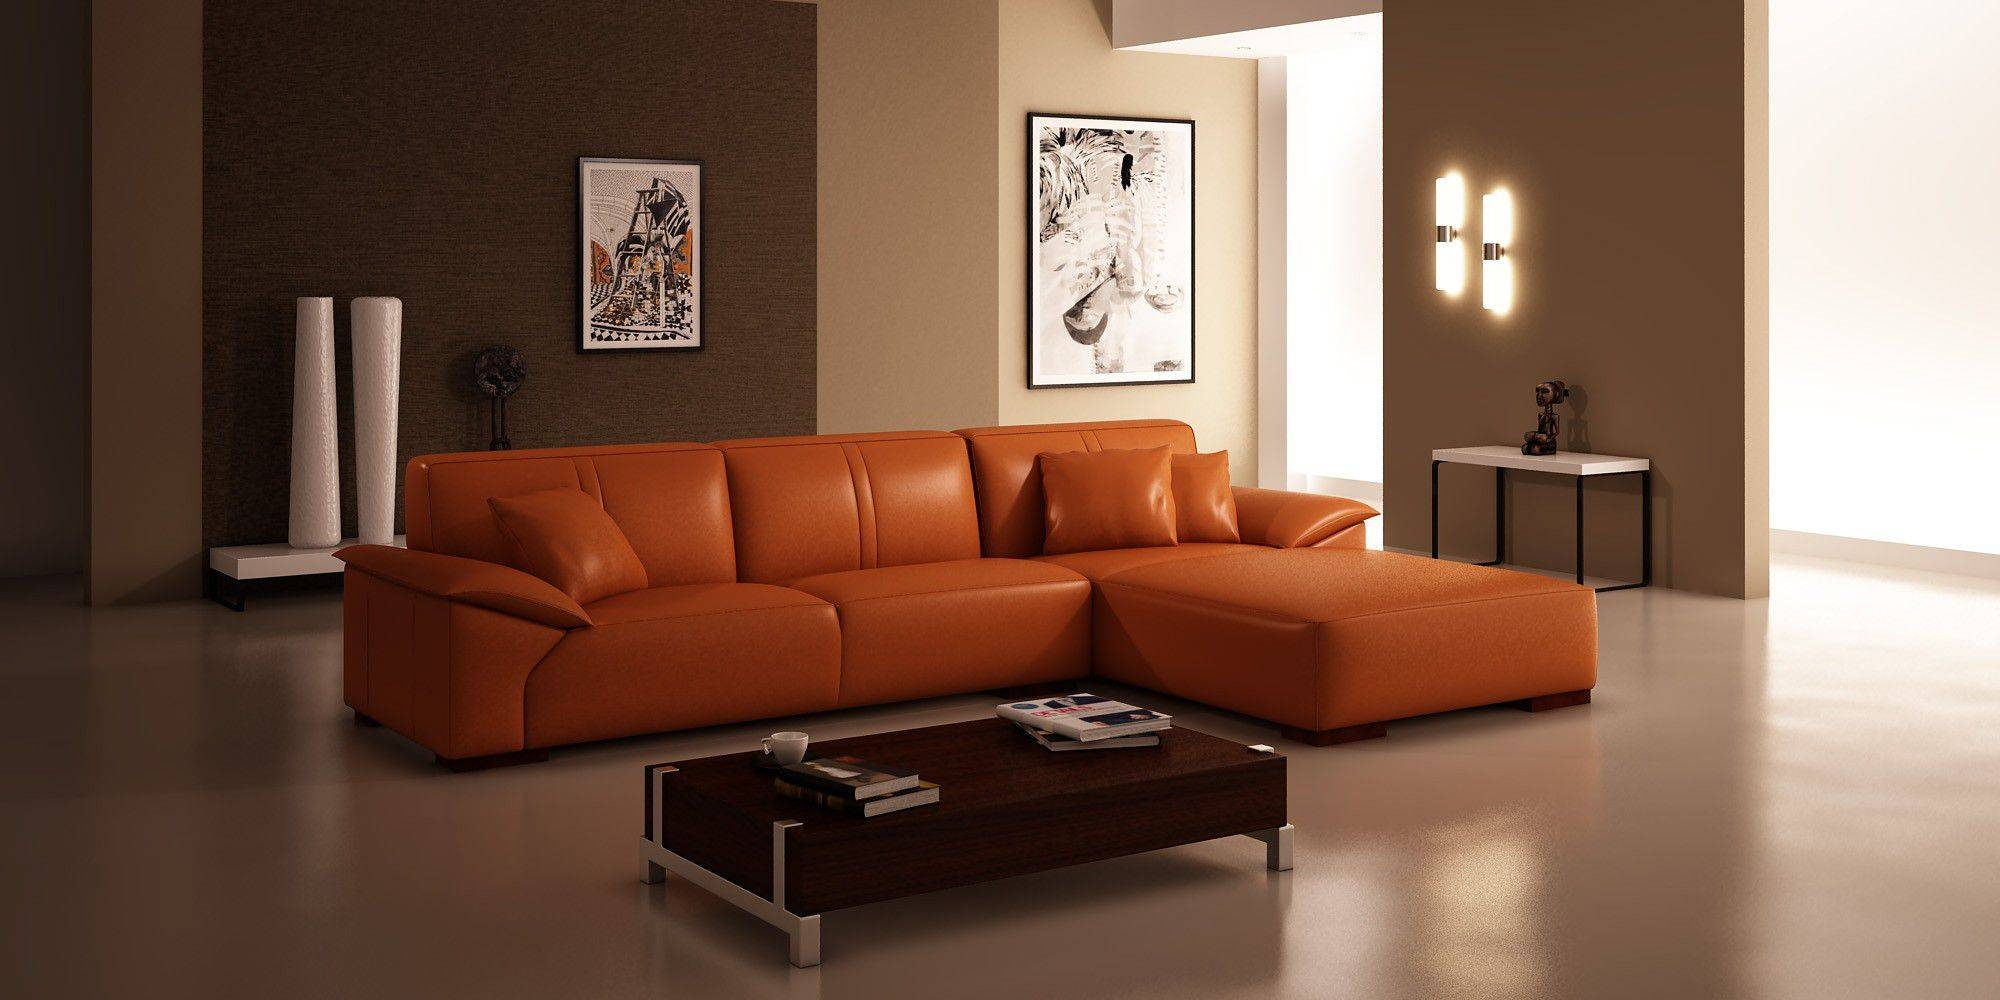 Orange Sofa Interior Design Winsome Living Room Furniture (View 15 of 15)